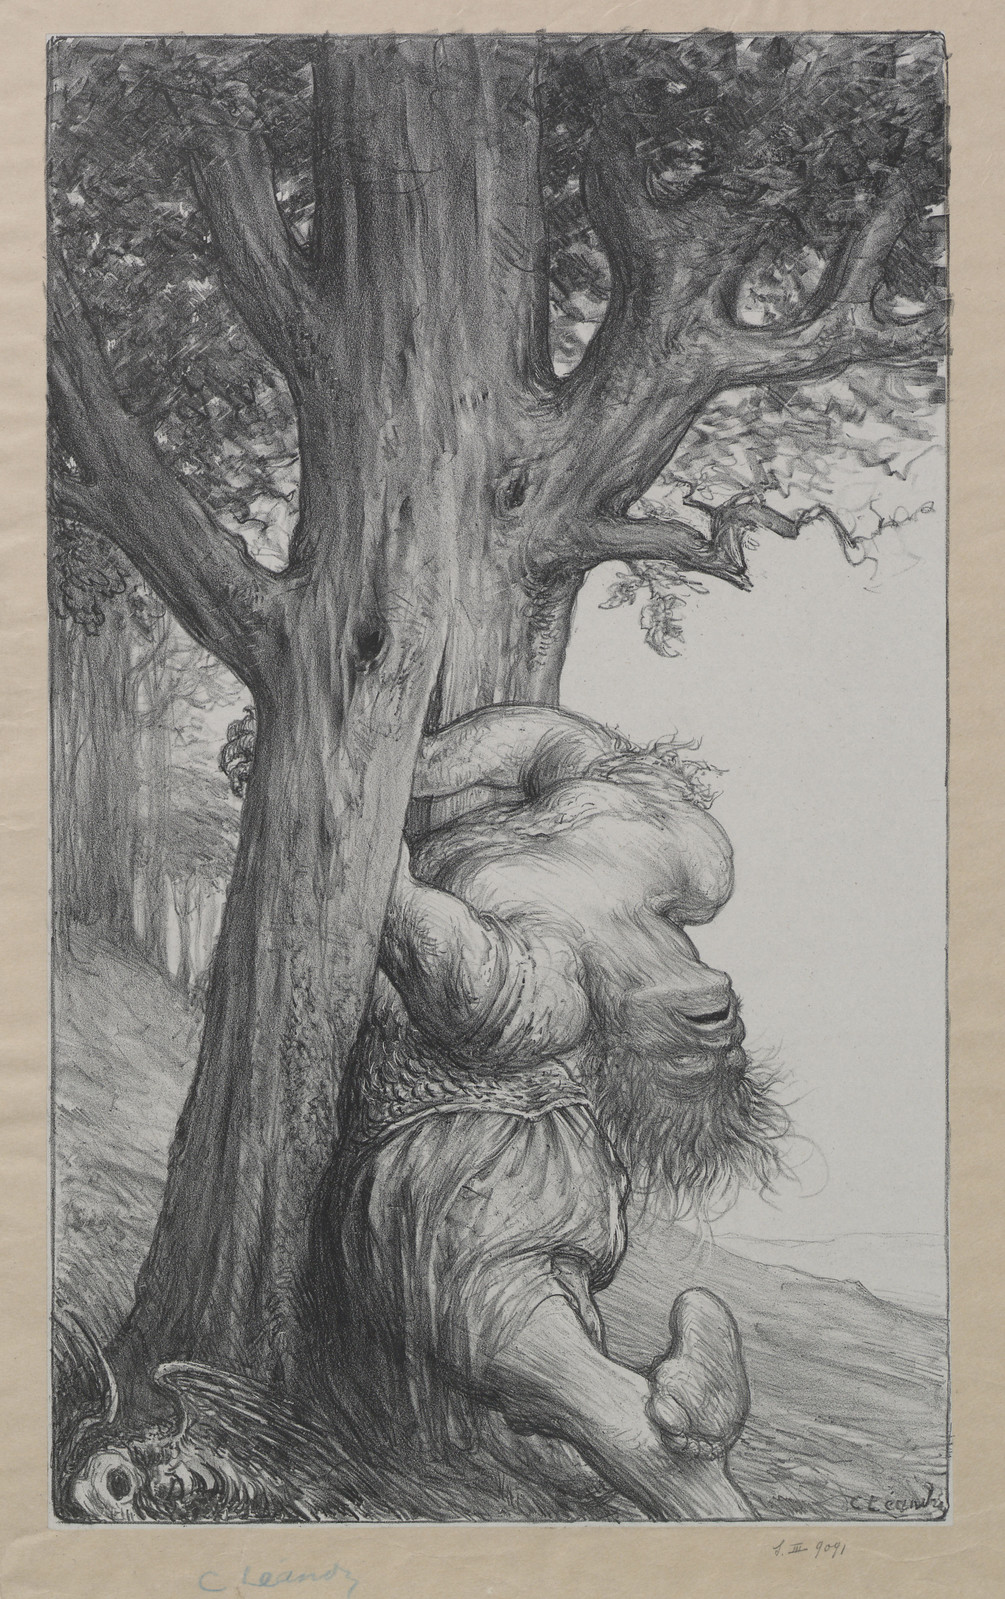 Charles Lucien Leandre - Vanquished The Old Gallic Oak, 1914-18